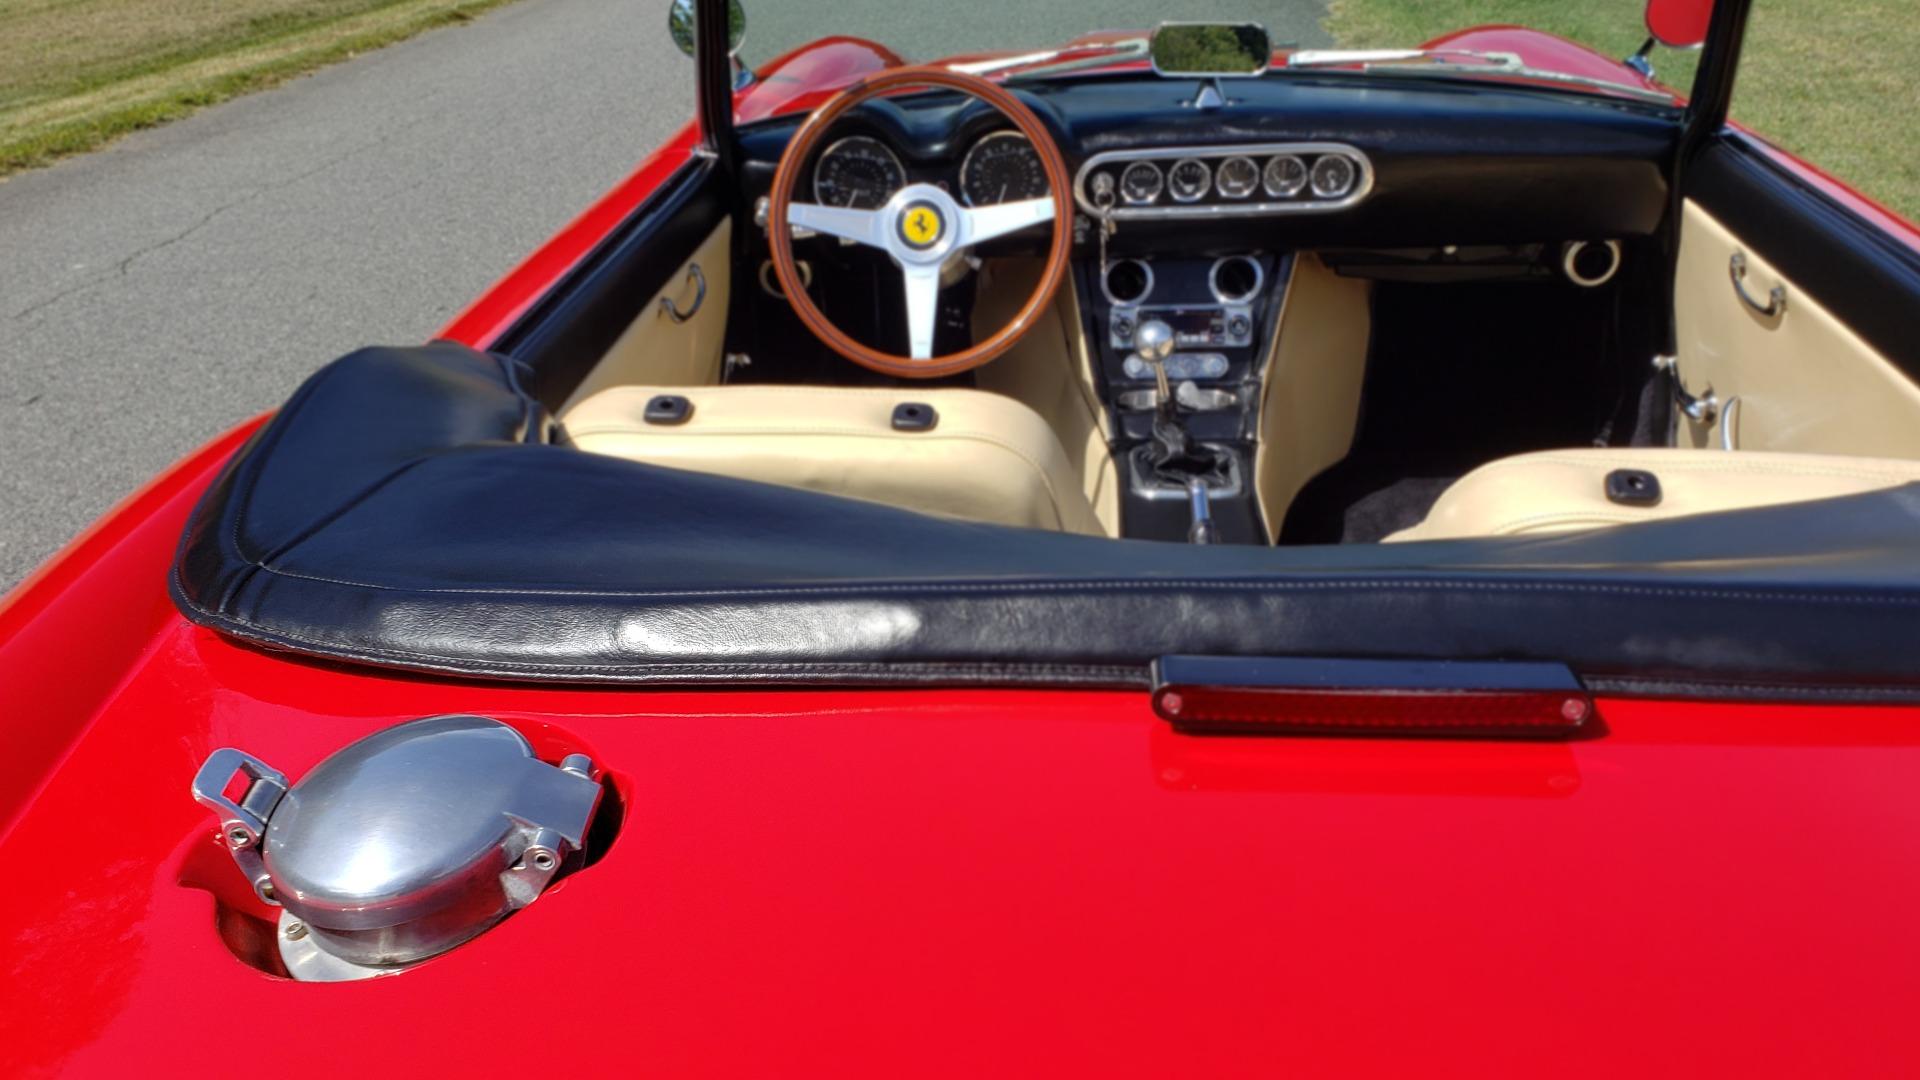 Used 1961 Ferrari 250GT SWB CALIFORNIA REPLICA / 302CI V8 / TREMEC 5-SPEED for sale Sold at Formula Imports in Charlotte NC 28227 17